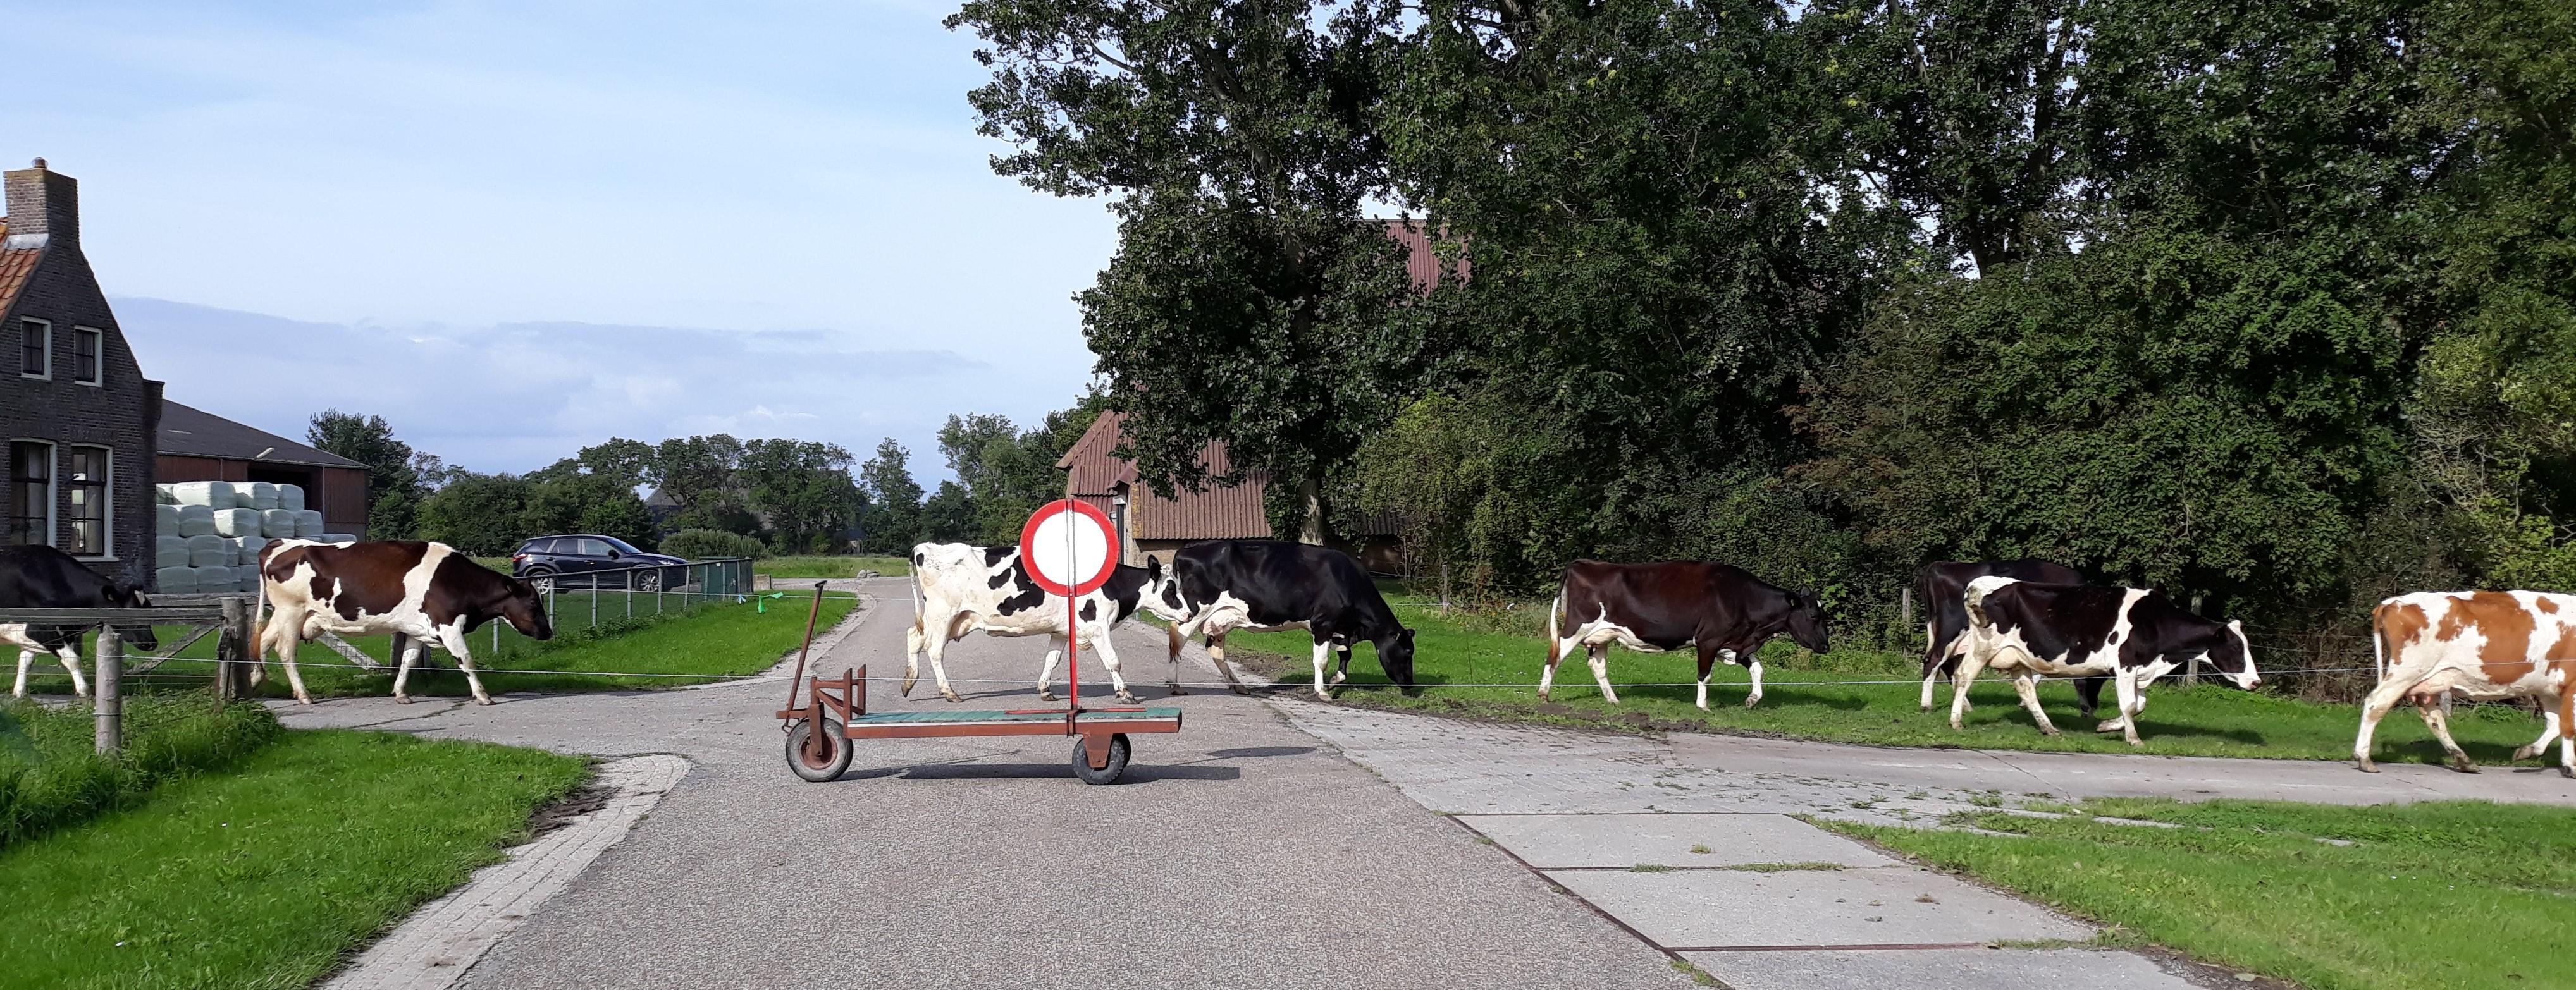 Overstekende koeien op de Foarryp